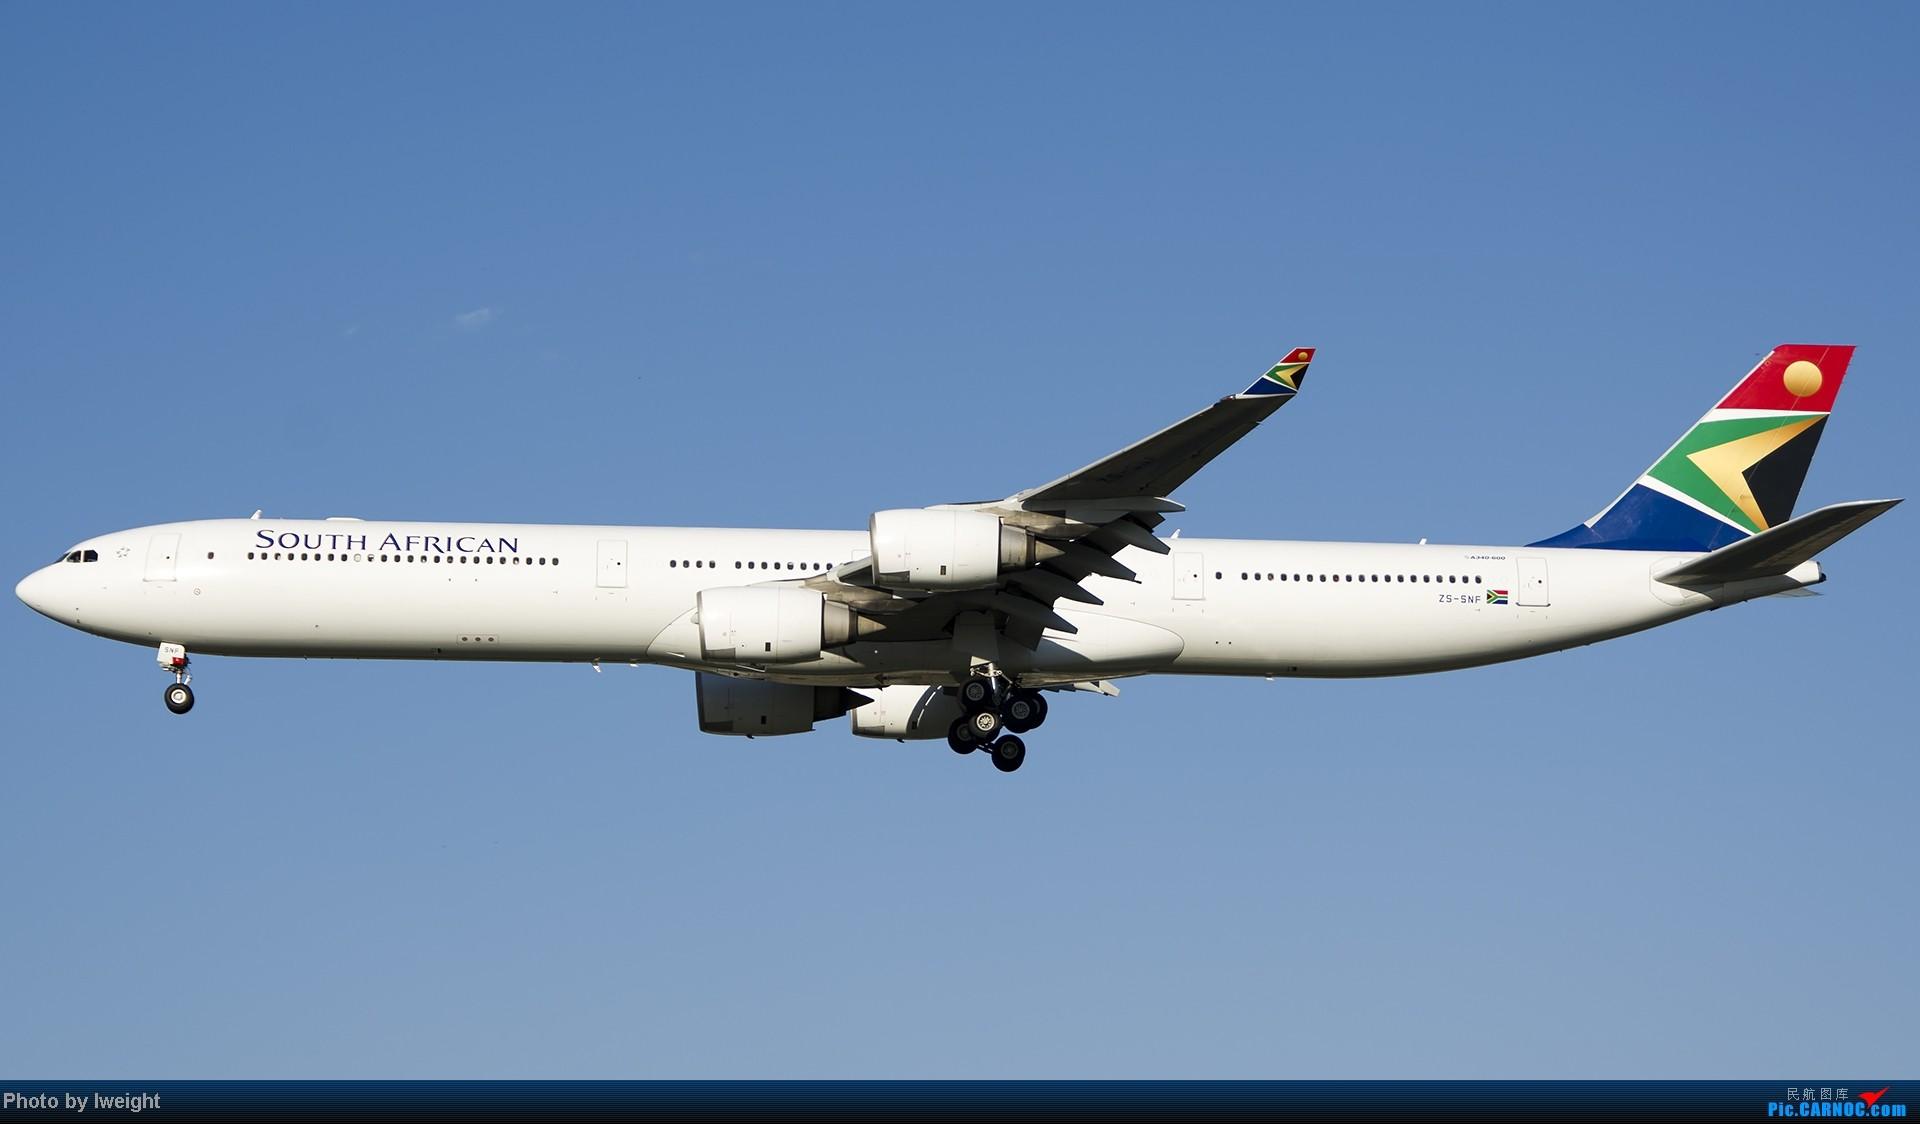 Re:[原创]新相机+好天气,PEK试机乱拍 AIRBUS A340-600 ZS-SNF 中国北京首都机场